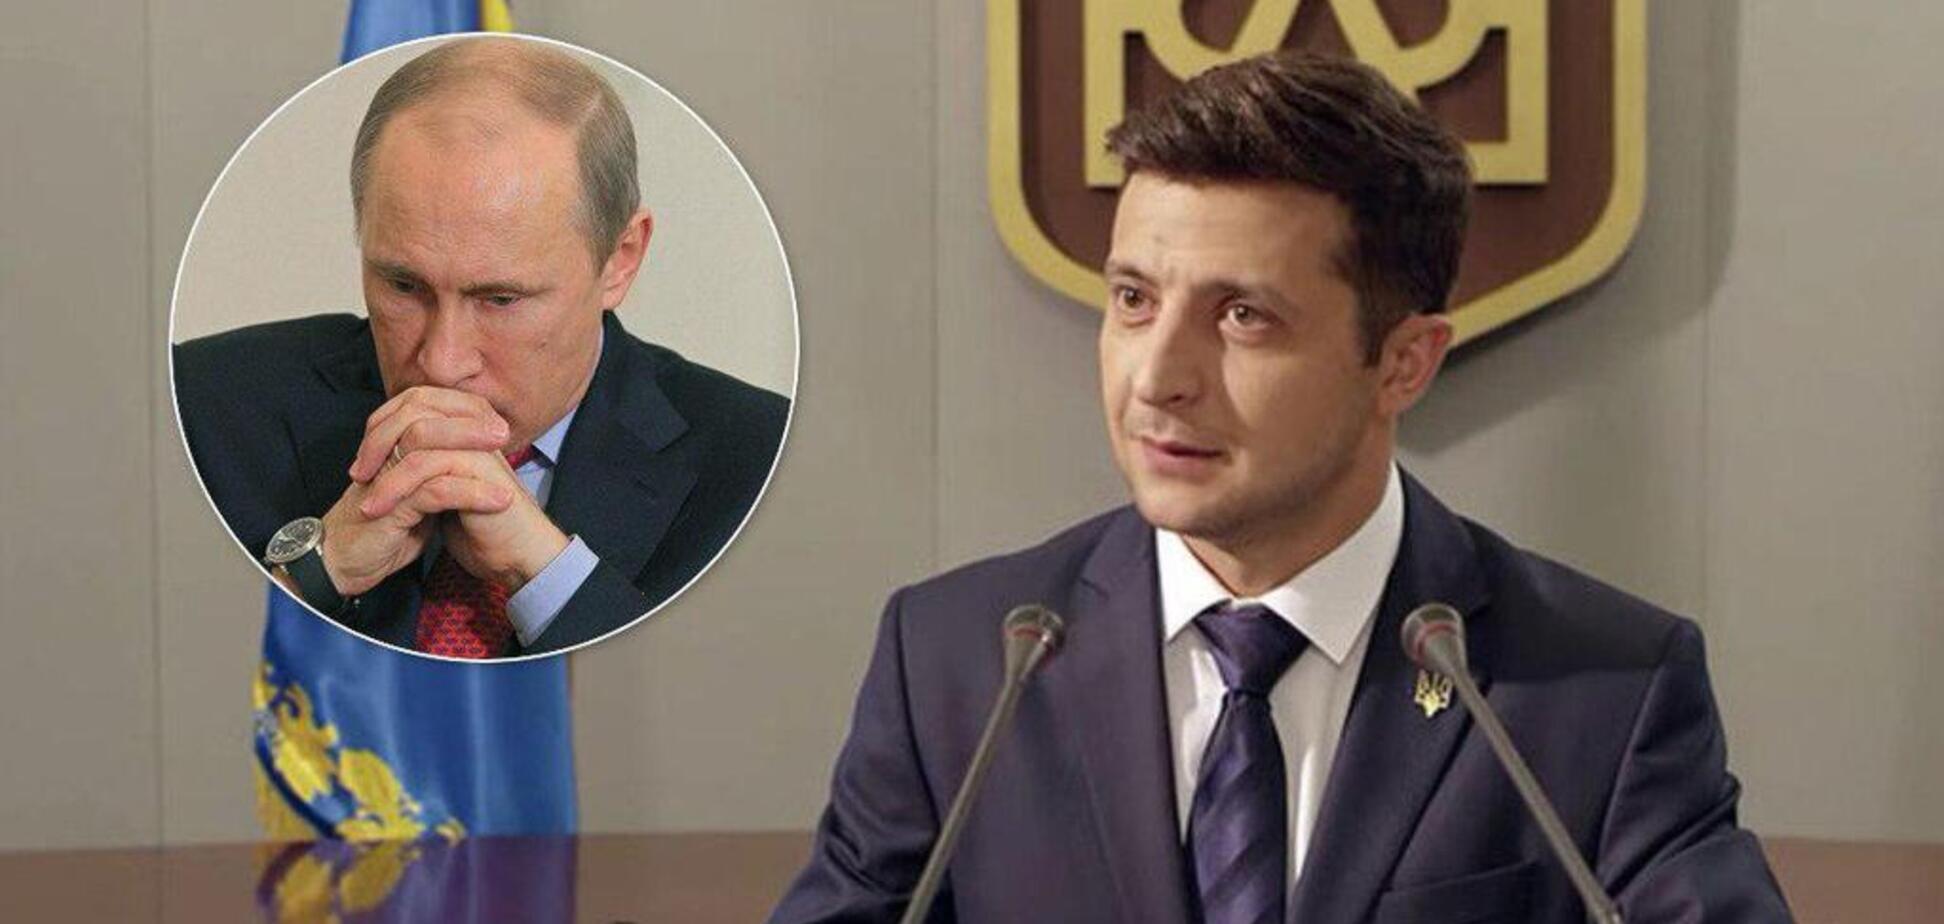 В Кремле разгромили советника Путина за слова о 'зачистке' Зеленского